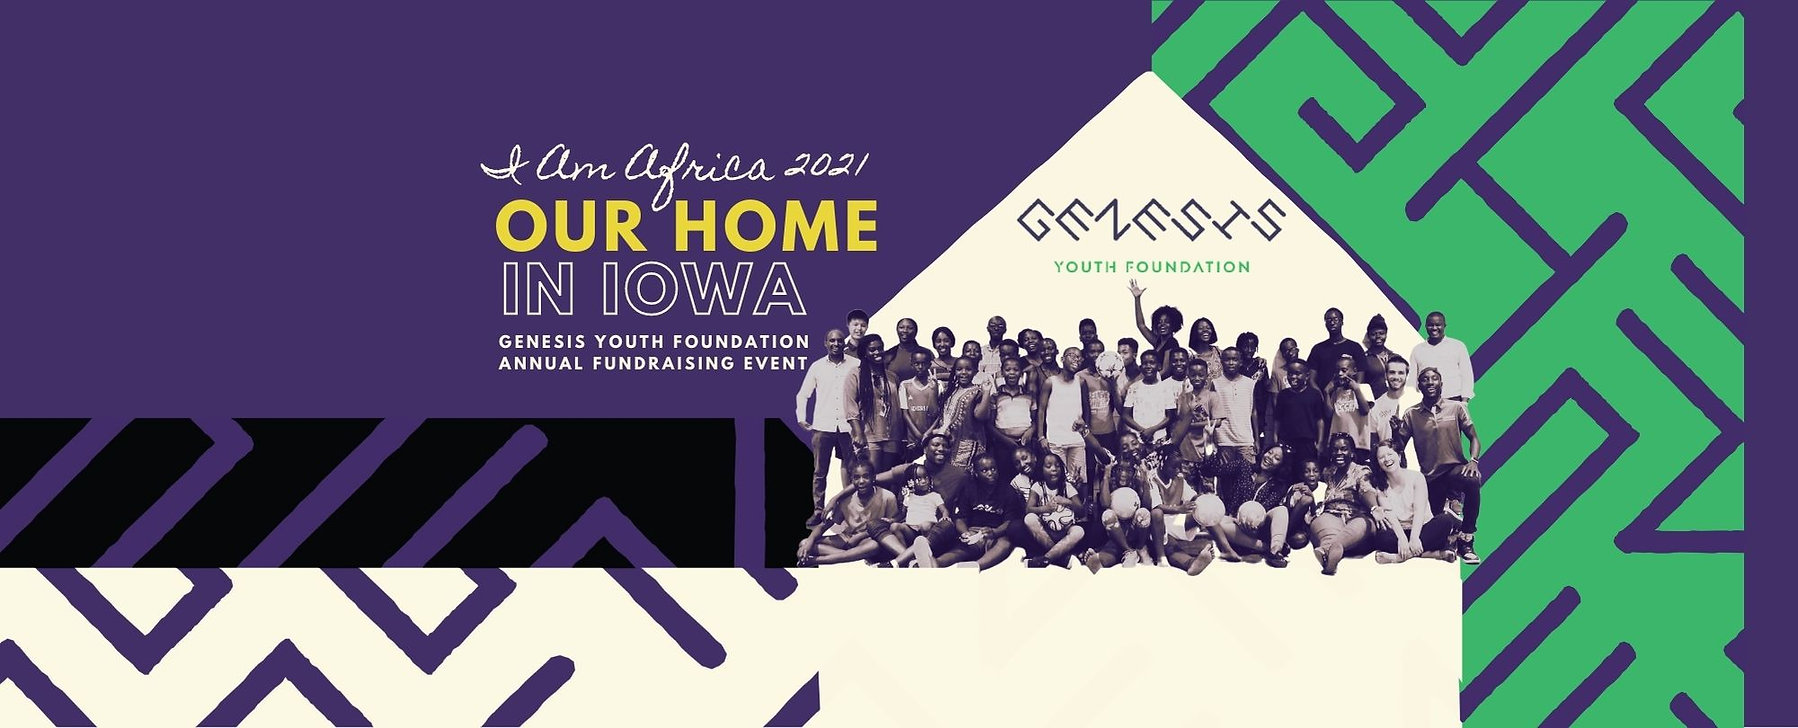 I Am Africa 2021 Website Event Cover Photo (1).jpg